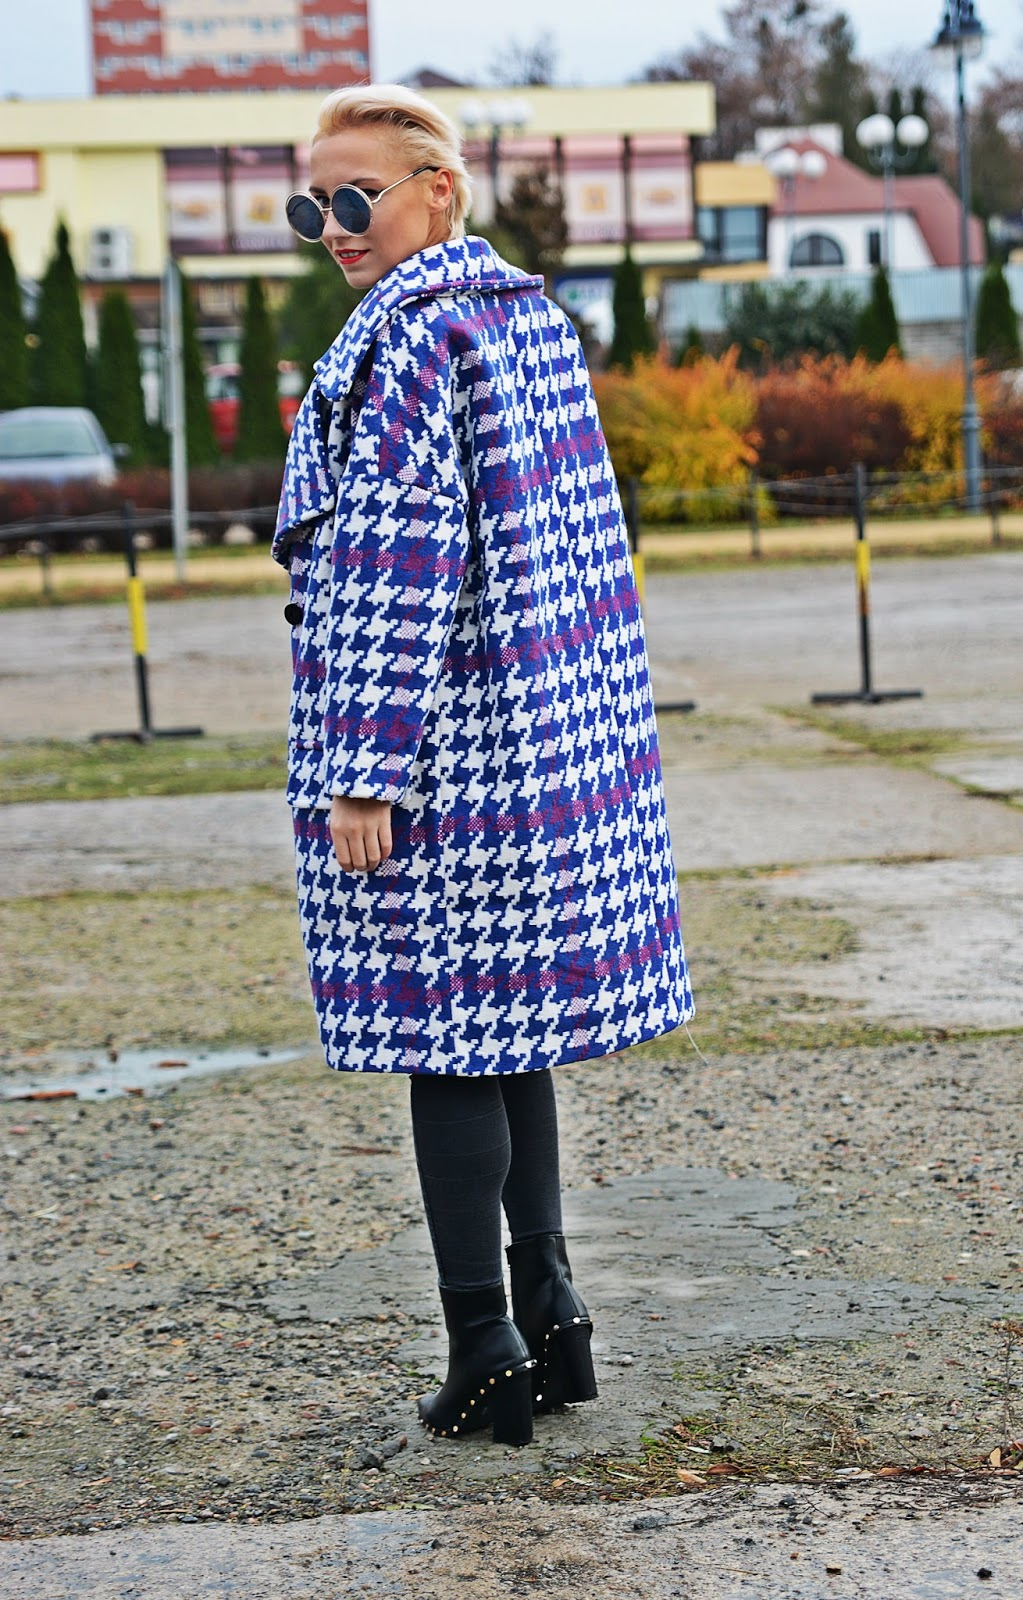 blog_modowy_karyn_pulawy_oversize_jacket